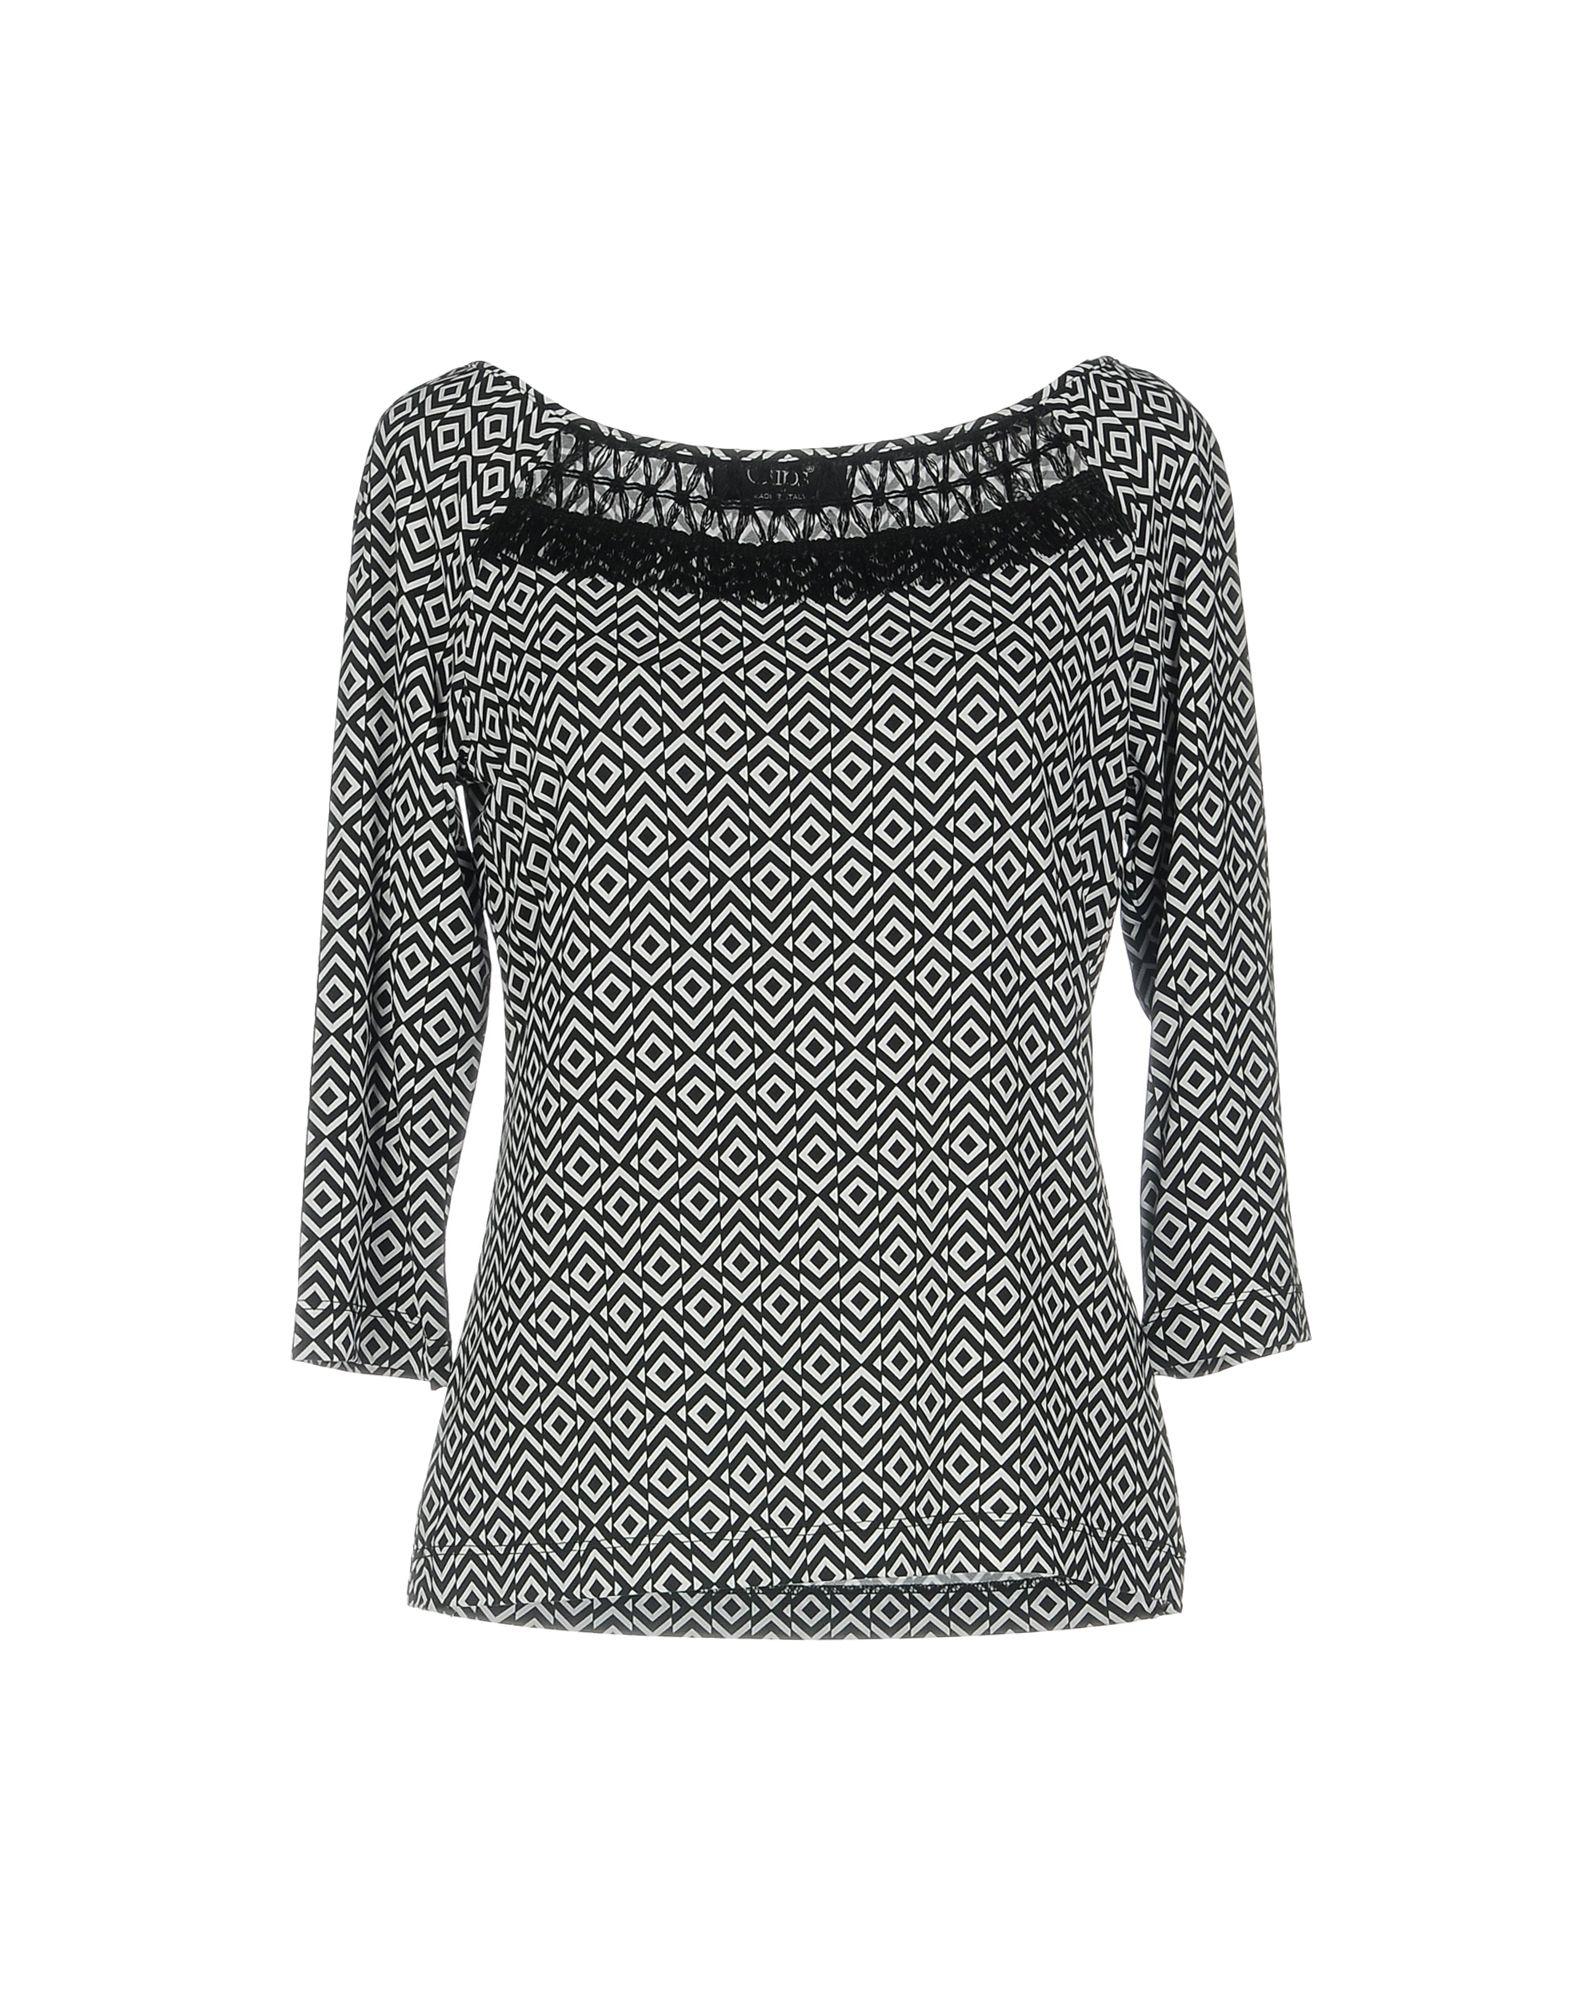 T-Shirt Clips Donna - Acquista online su KcGuU